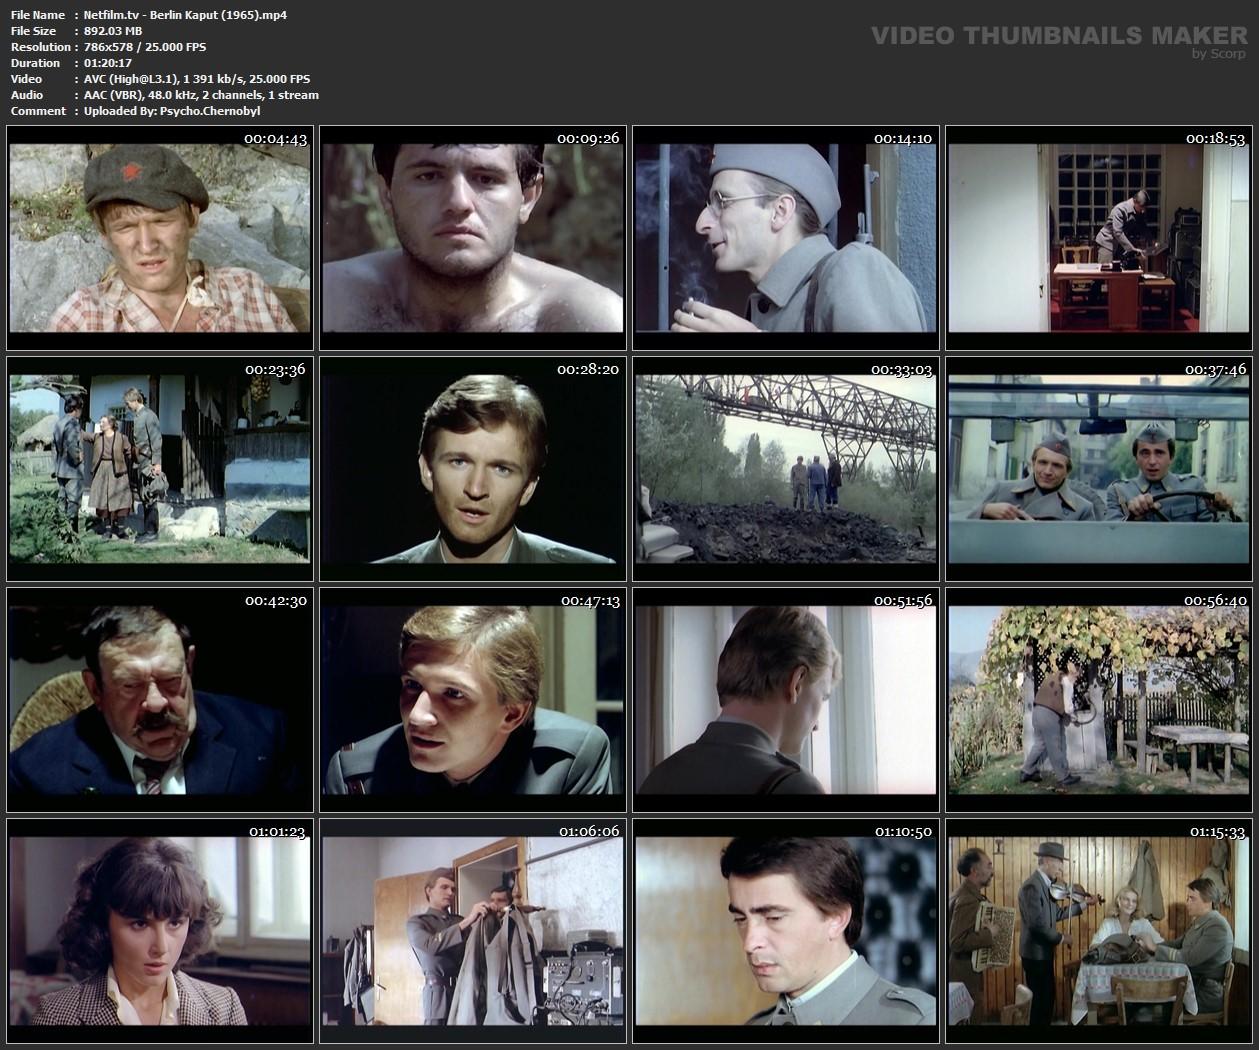 Netfilm-tv-Berlin-Kaput-1965-mp4.jpg